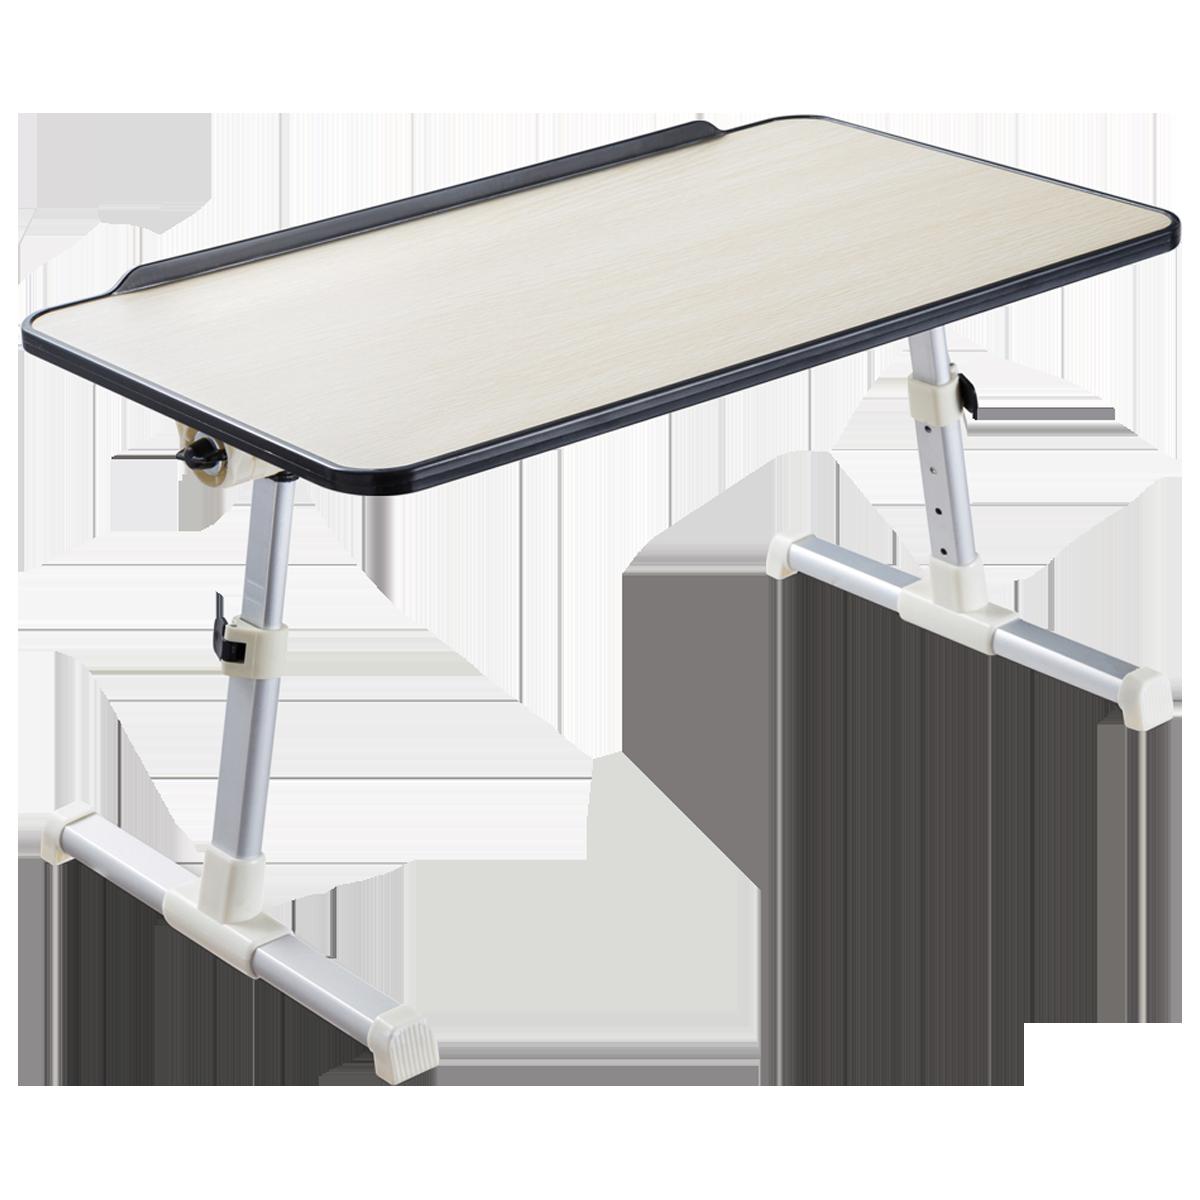 Neopack Ergonomic Laptop Table For 13-16 inch Laptops (Multiple Levels Height Adjustment, ELTBR, Beige)_1